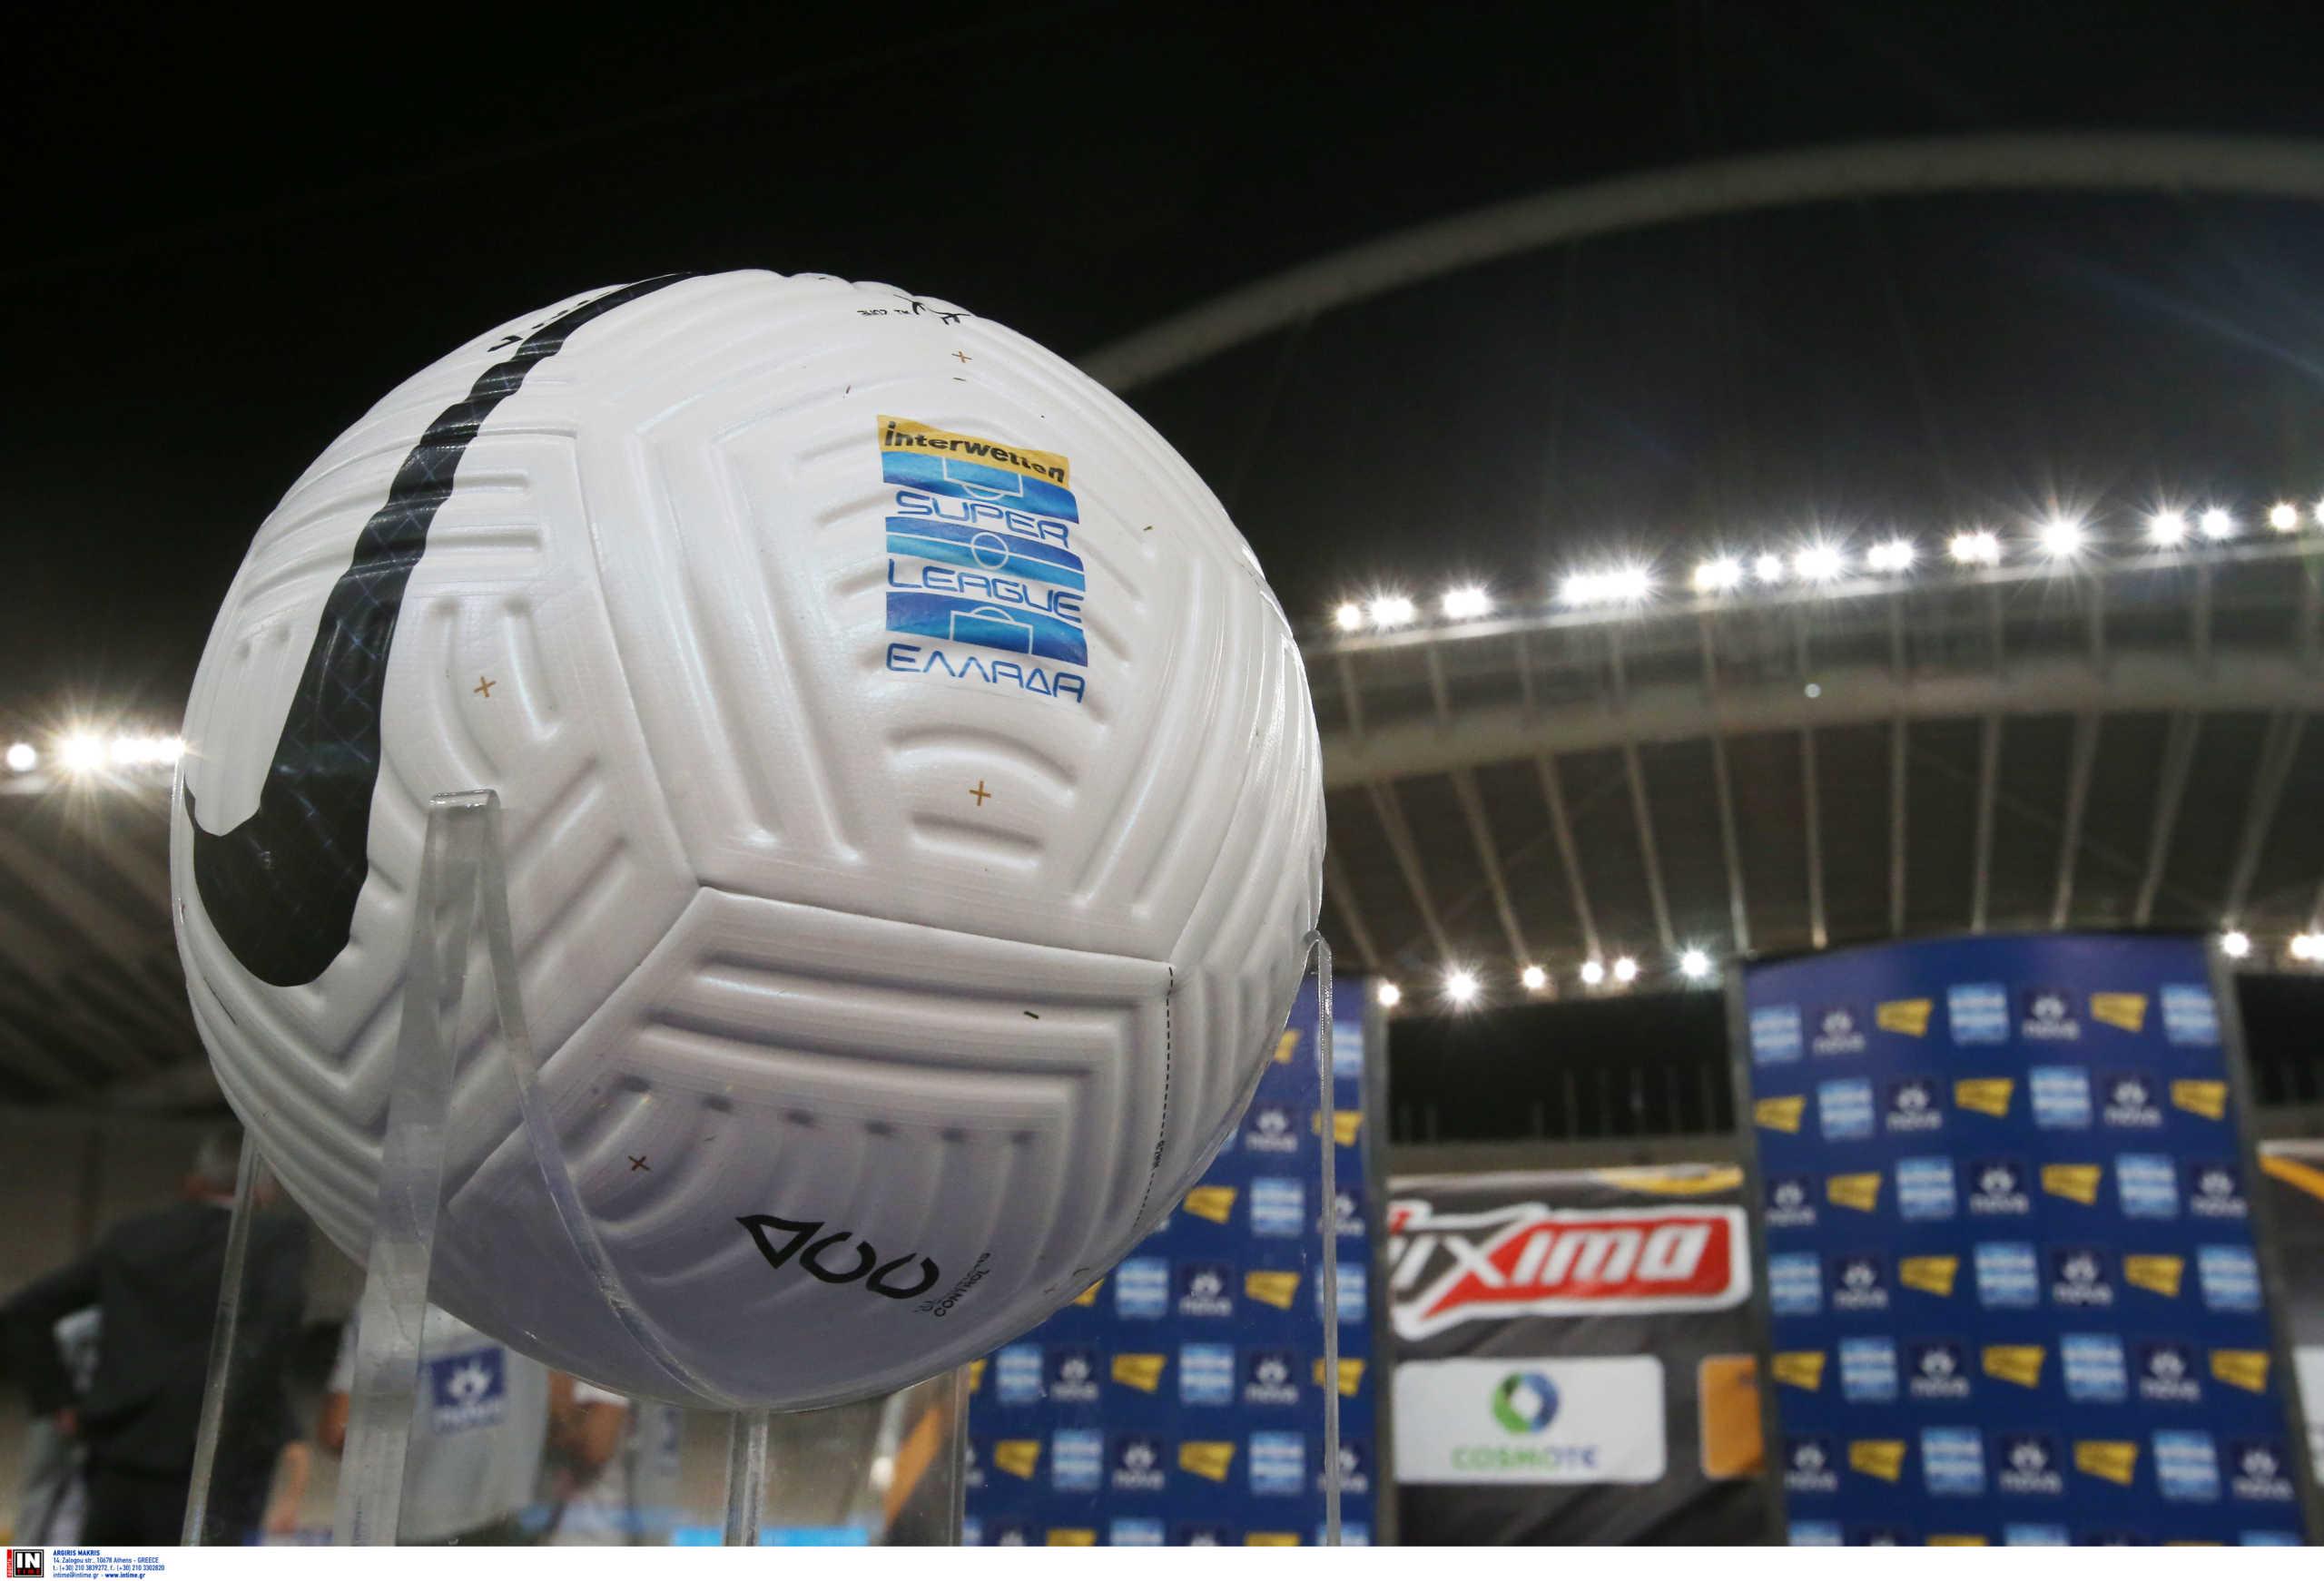 Superleague: ΑΕΚ και ΠΑΟΚ ψάχνουν αντίδραση – Για τη συνέχεια του αήττητου ο Ολυμπιακός